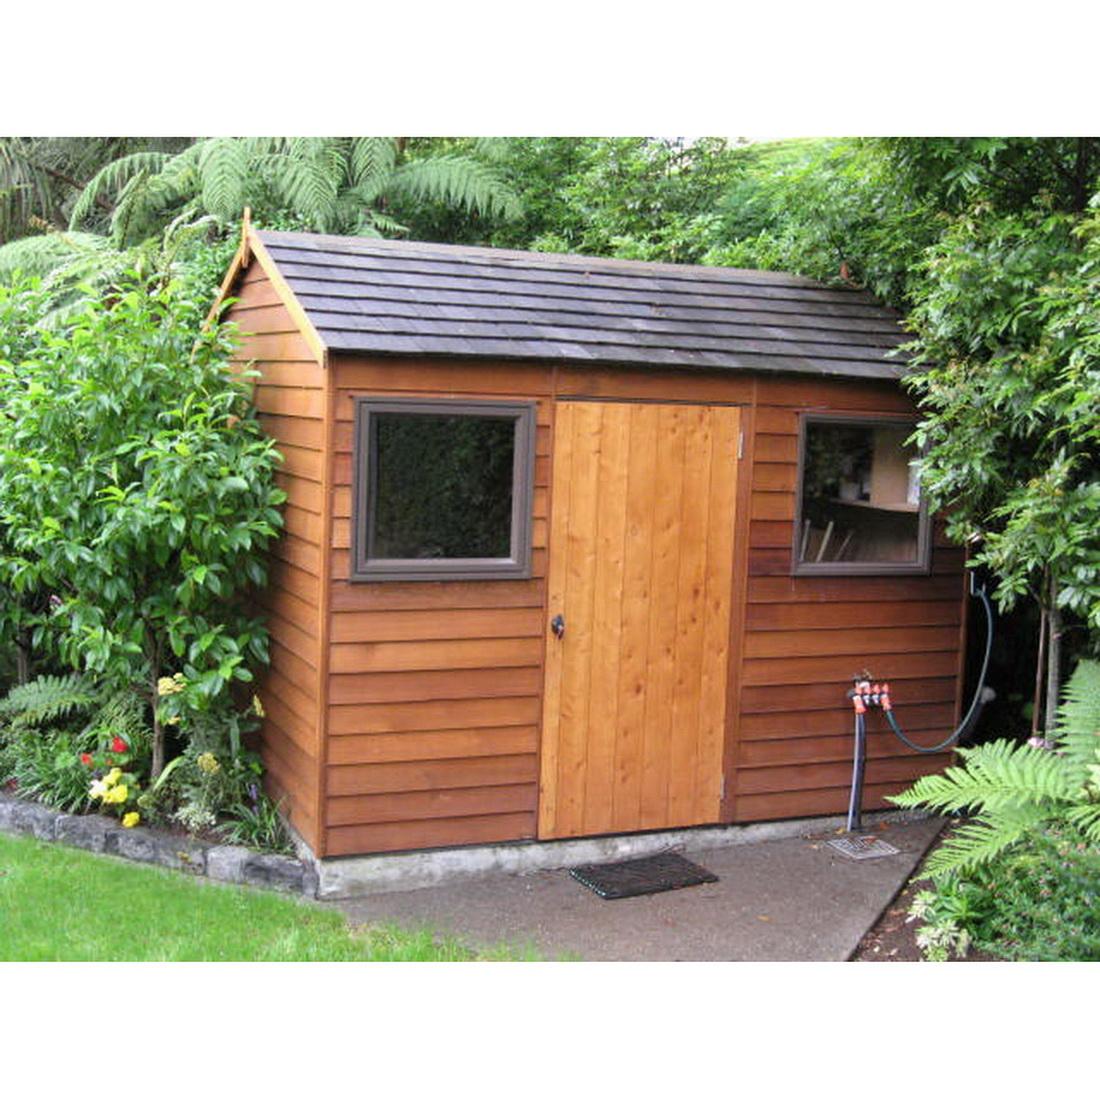 Montrose Coloursteel Roof Kitset Garden Timber Shed 3 x 2.5 x 2.46 m Natural CMOC